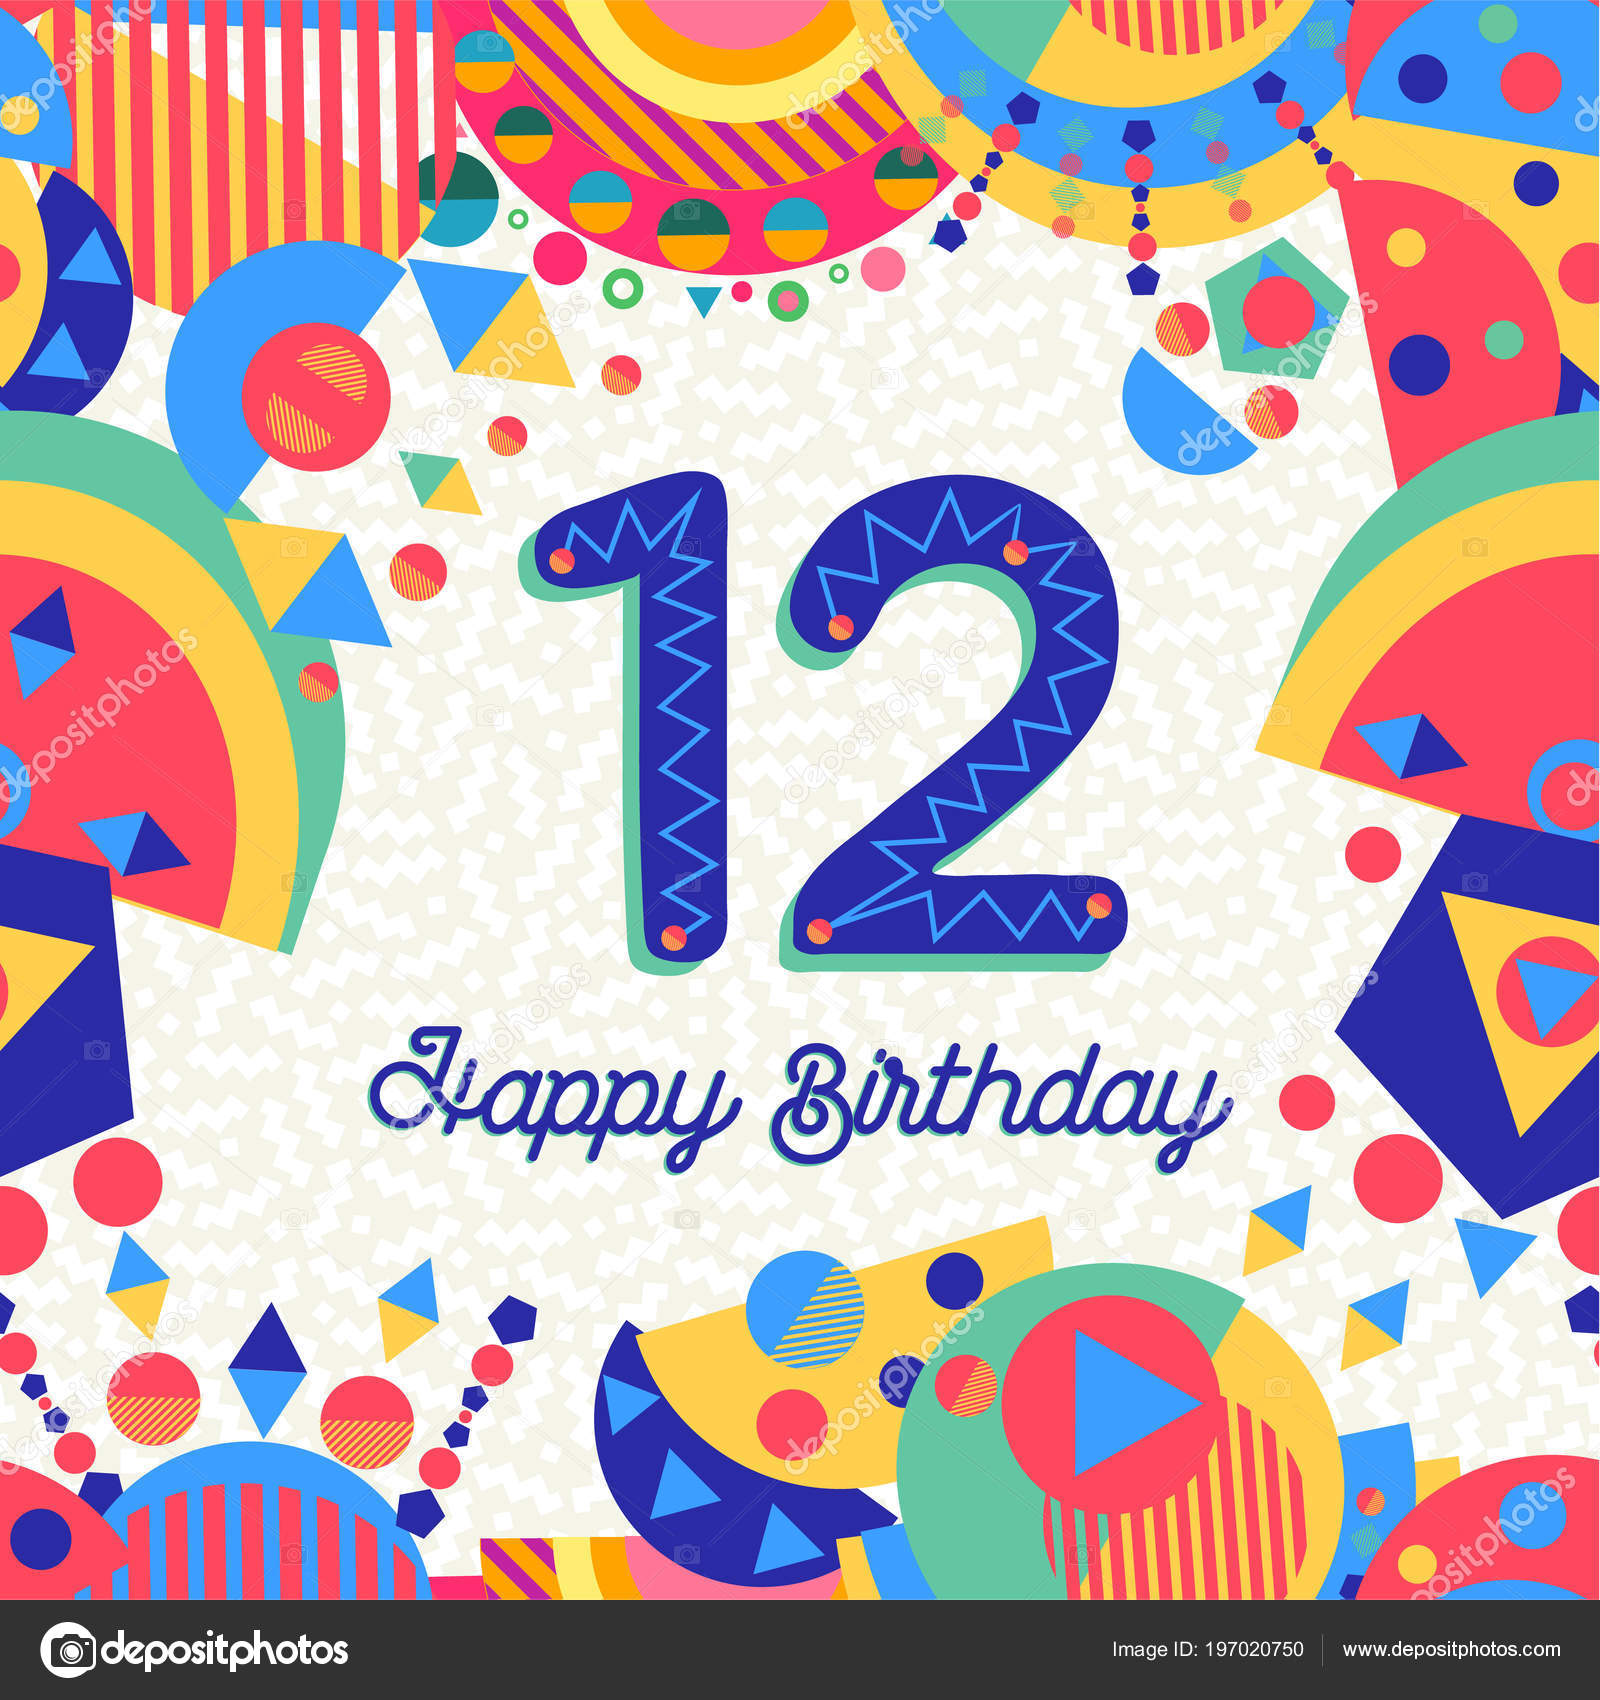 Fonkelnieuw Happy Birthday Twelve Year Fun Design Number Text Label Colorful YO-86